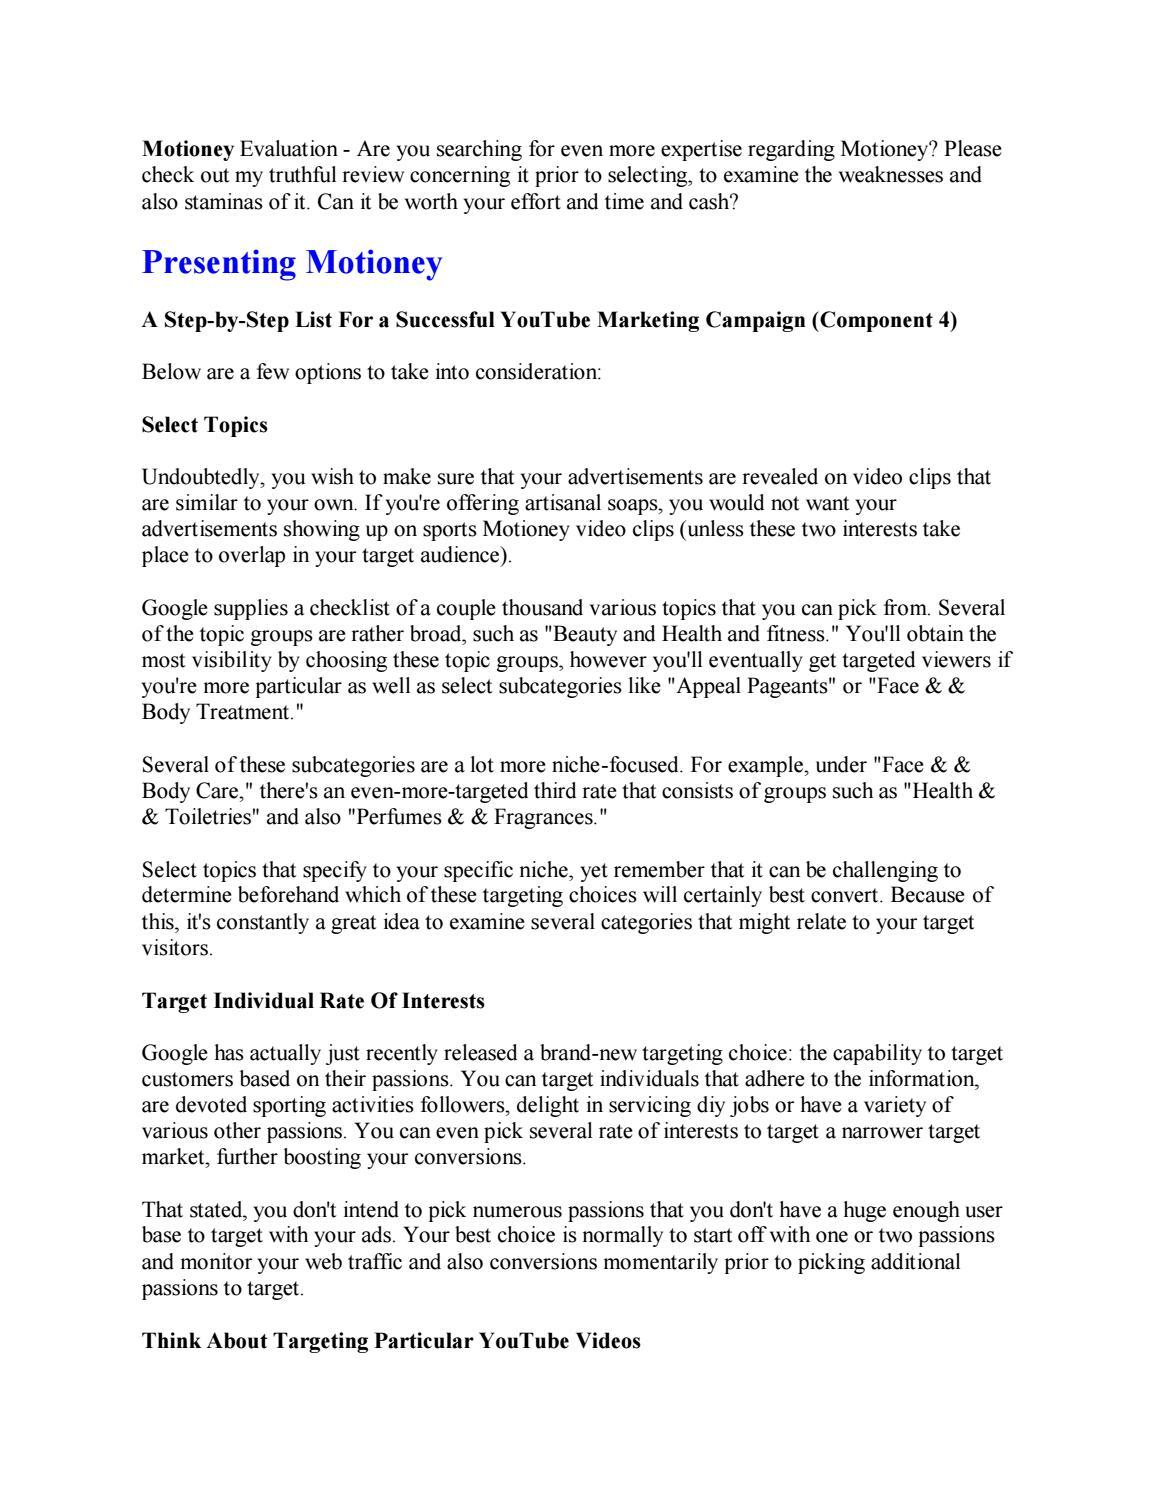 Motioney Review And Free Bonus by richardlarue - issuu